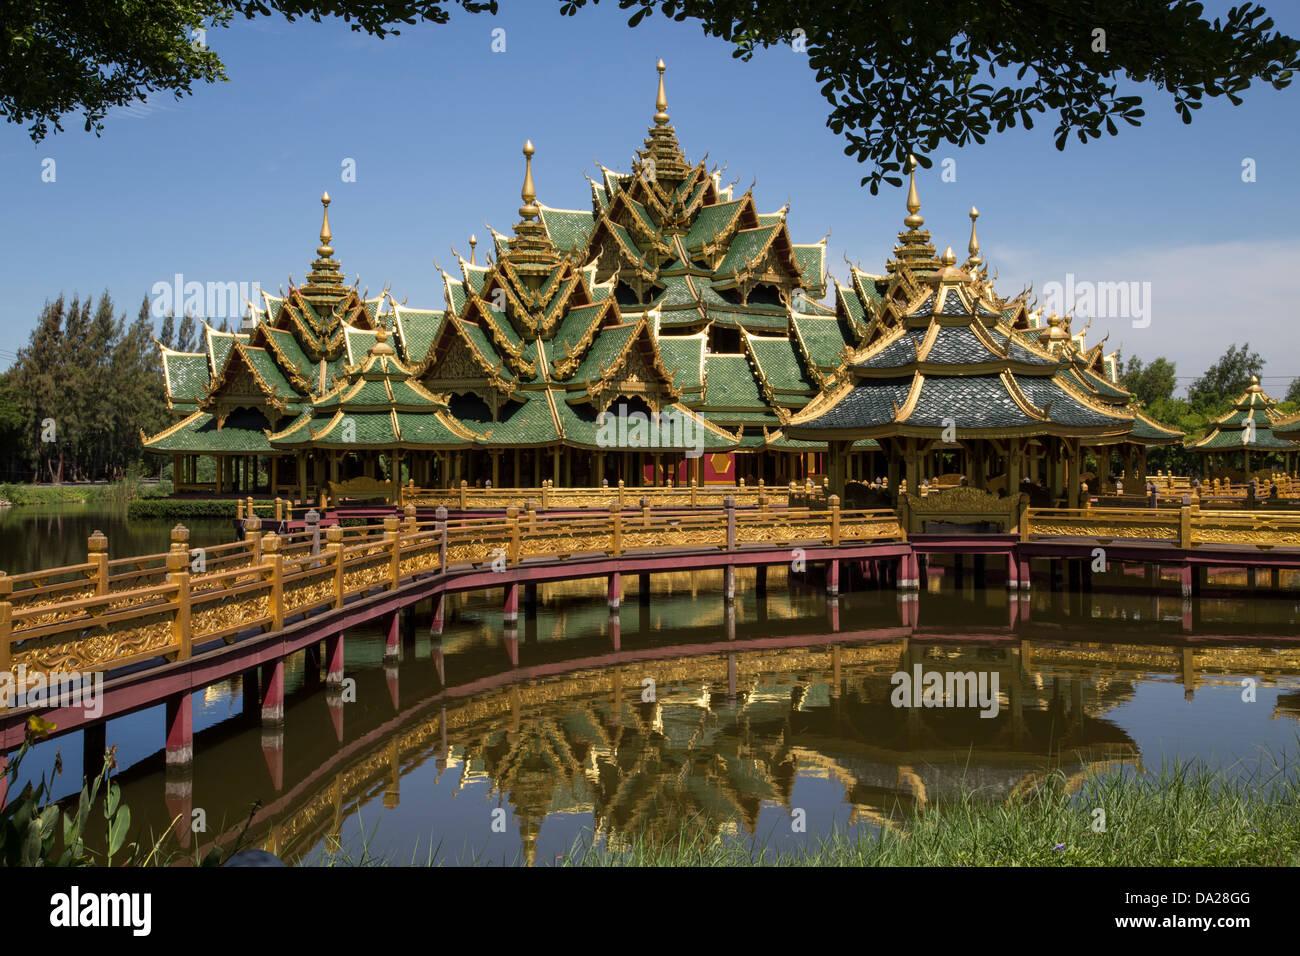 Ancient Siam Park Stock Photos & Ancient Siam Park Stock Images - Alamy